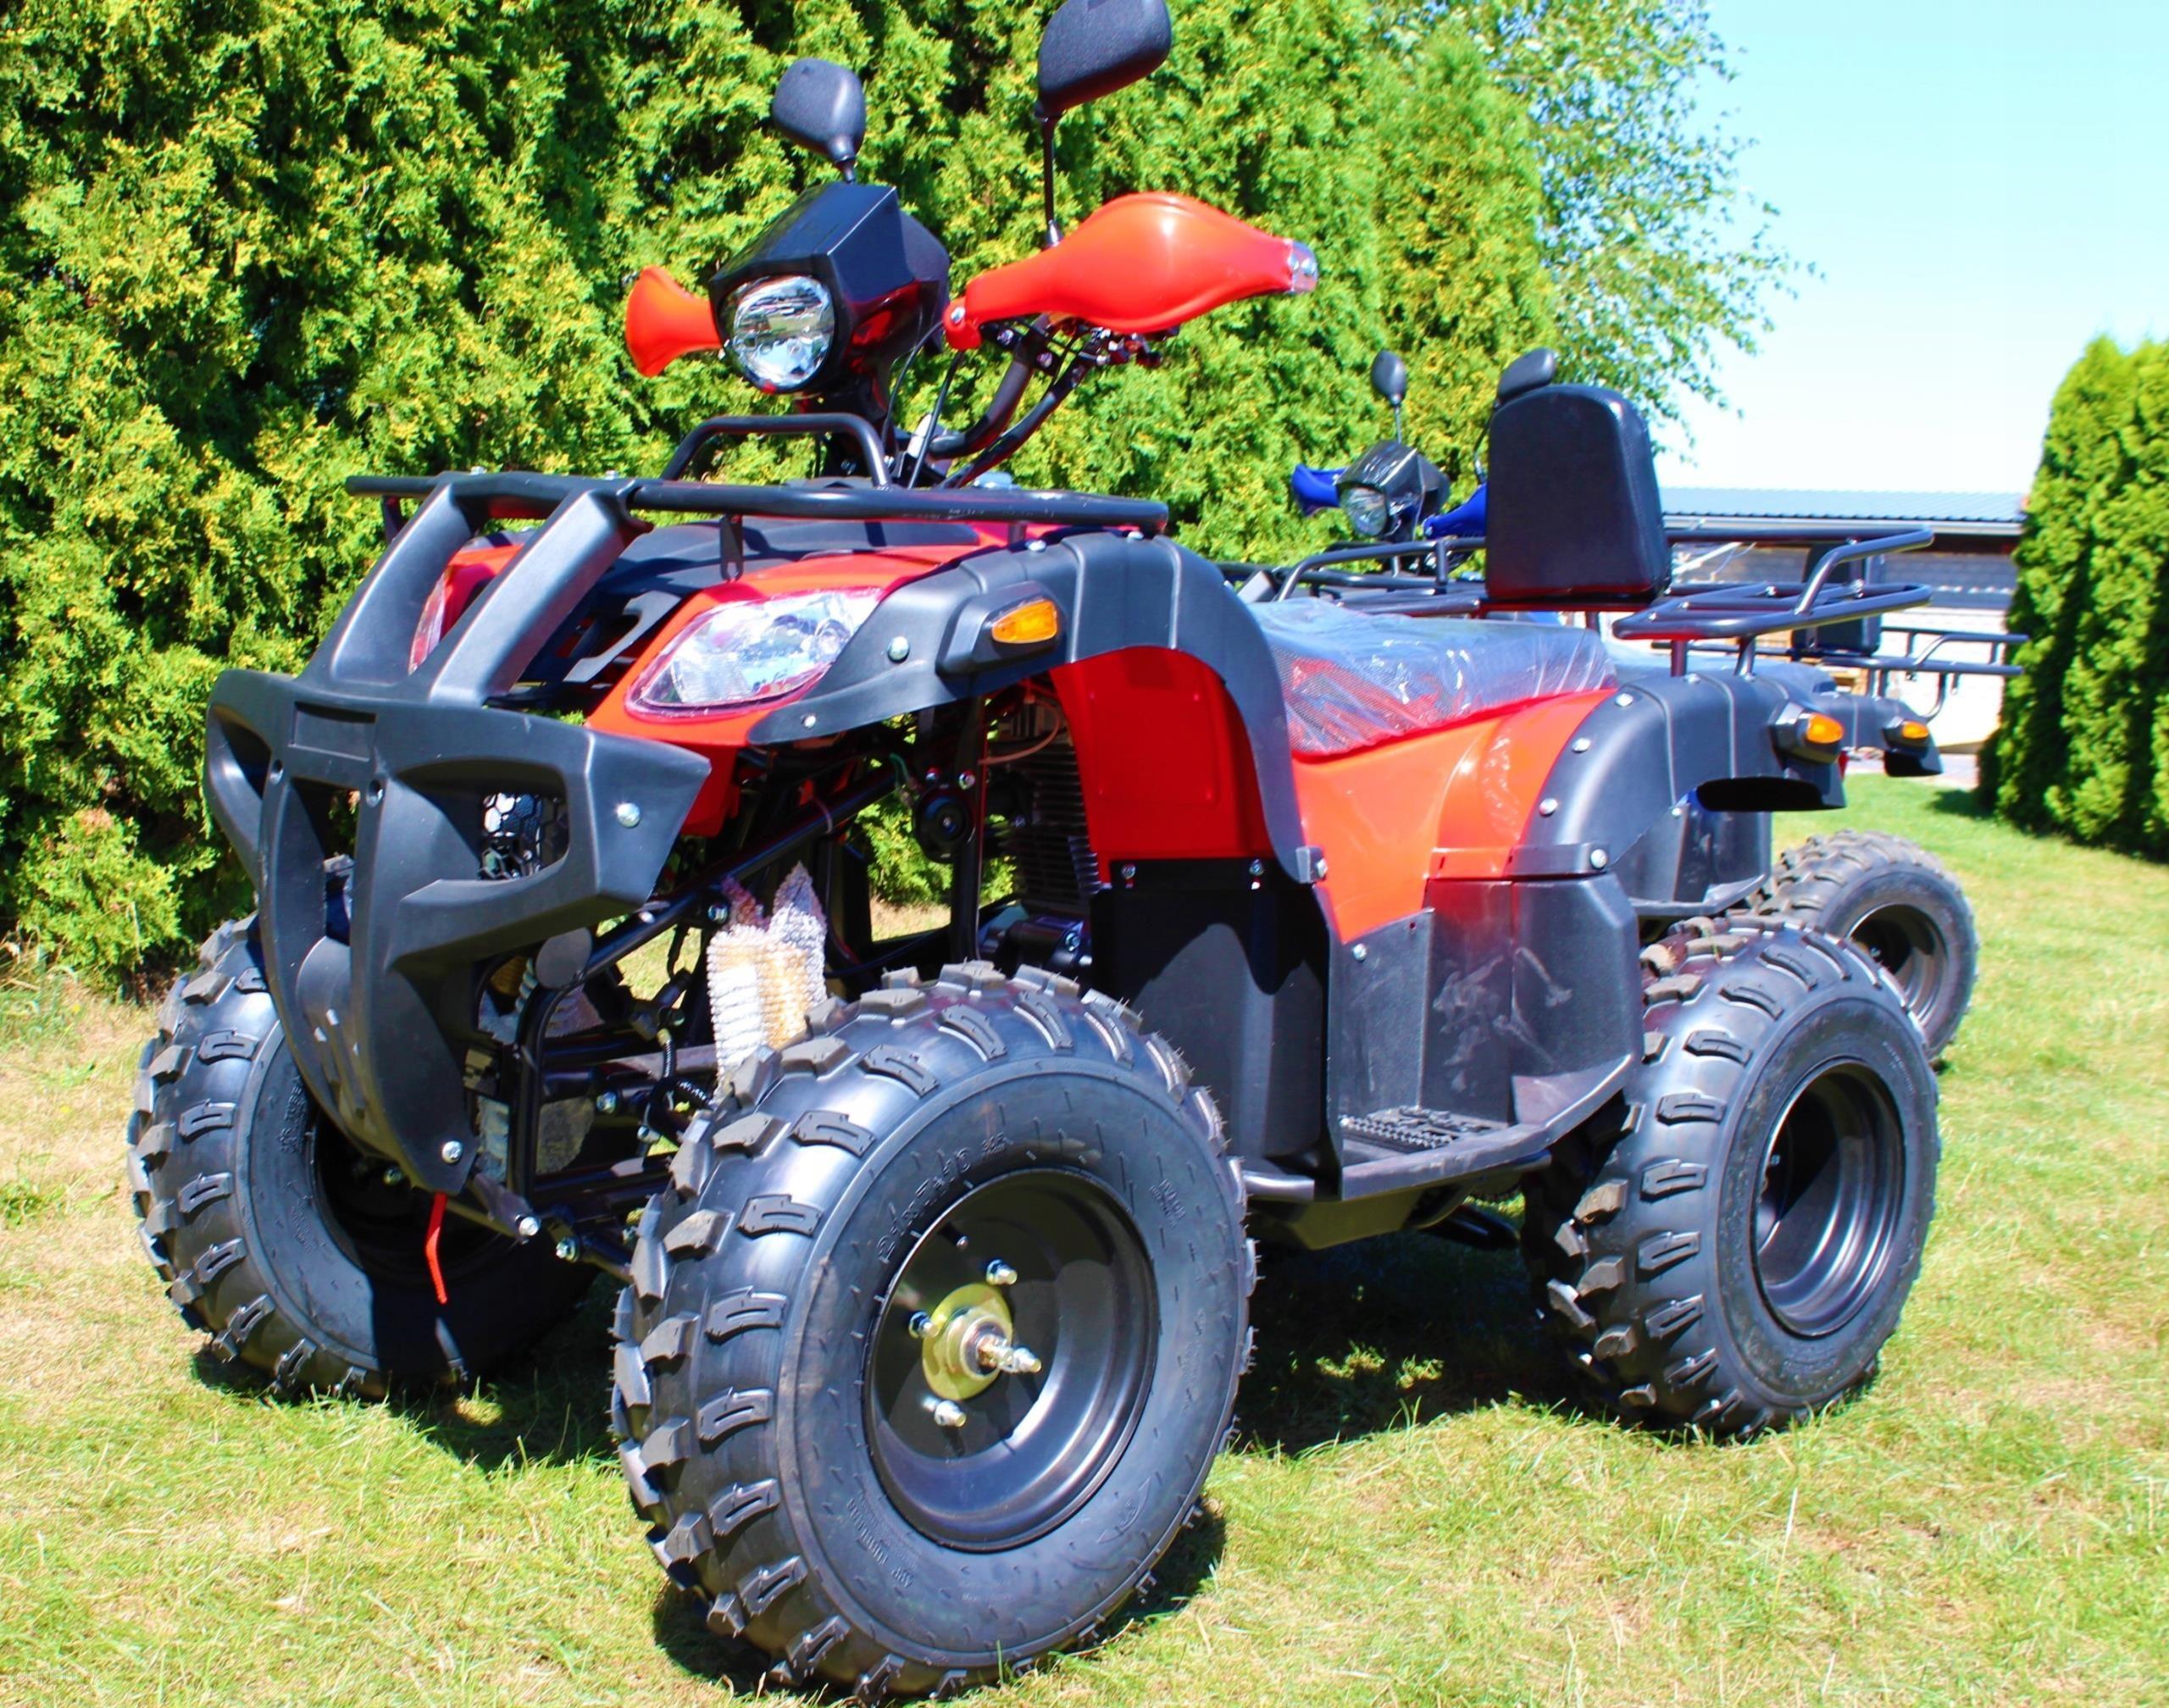 Quad 250 Cc Big Hummer 2019 Kola 10 Wyciagarka Opinie I Ceny Na Ceneo Pl